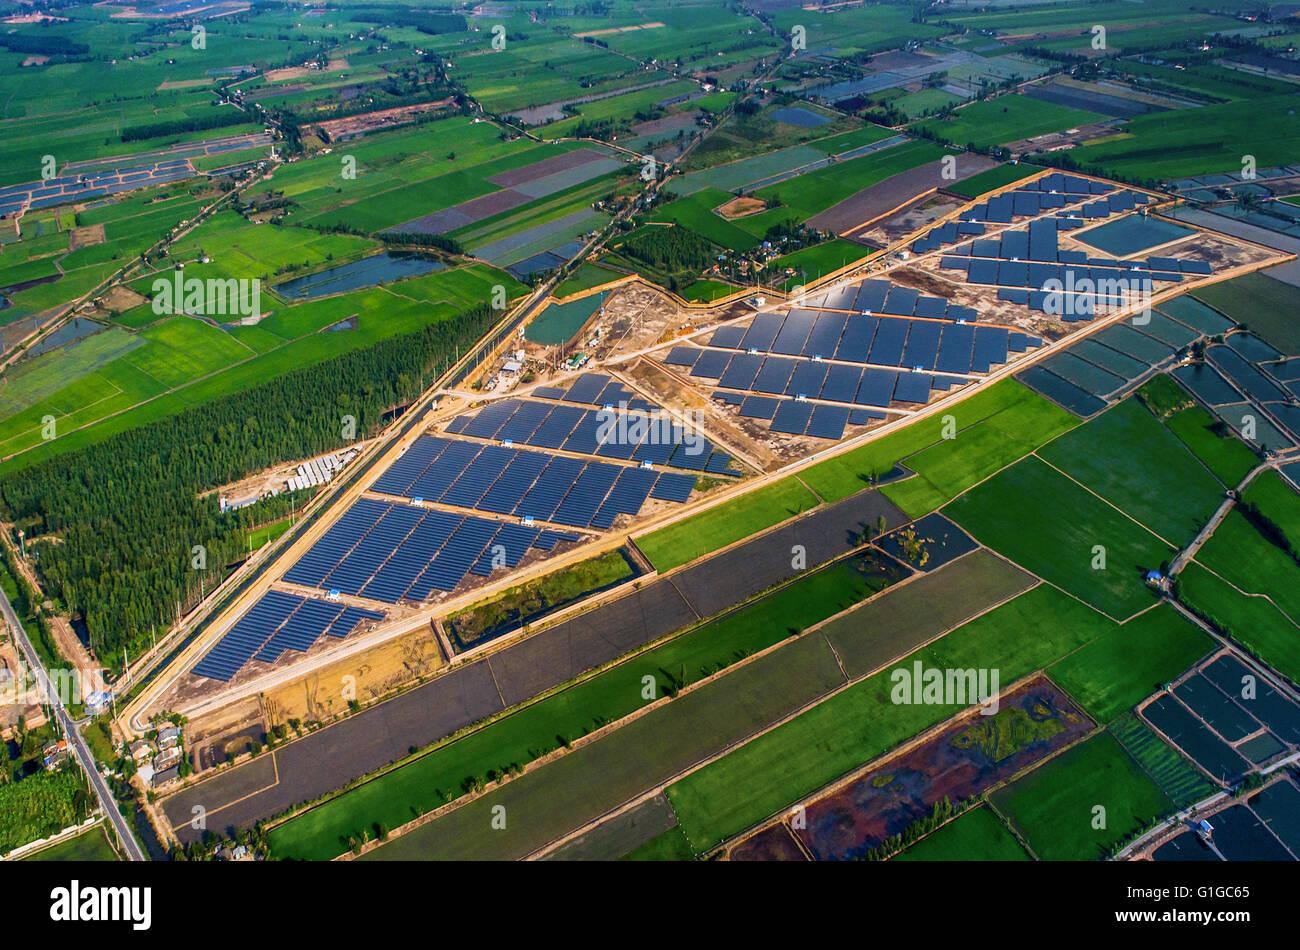 Solar farm, solar panels from the air - Stock Image